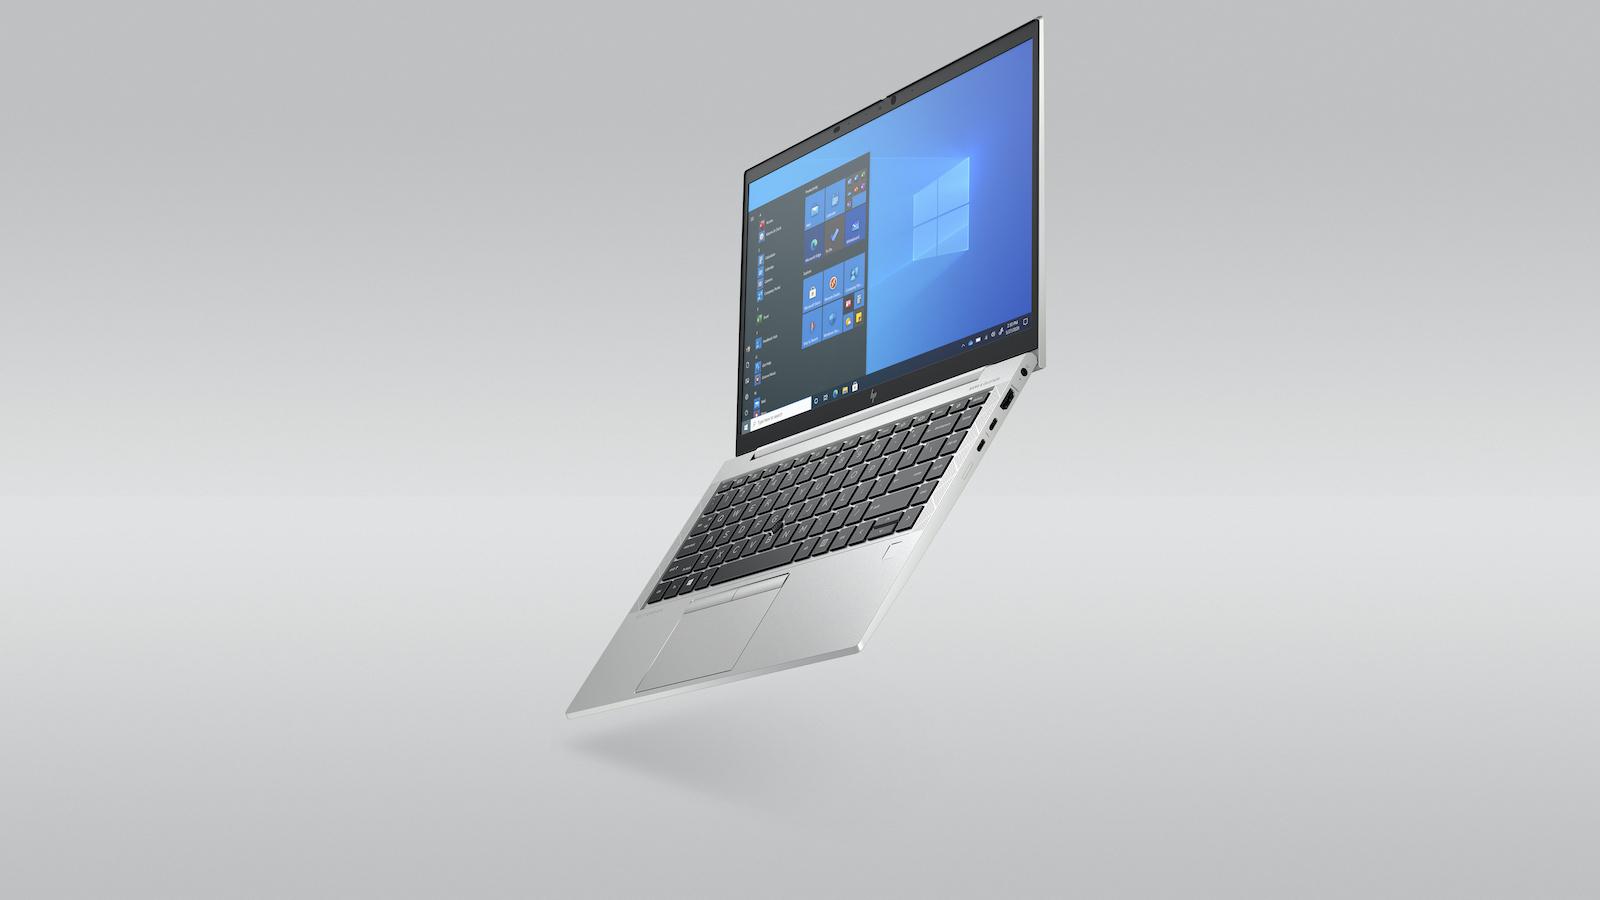 HP EliteBook 840 G8 Aero notebook is a productivity powerhouse for multi-tasking